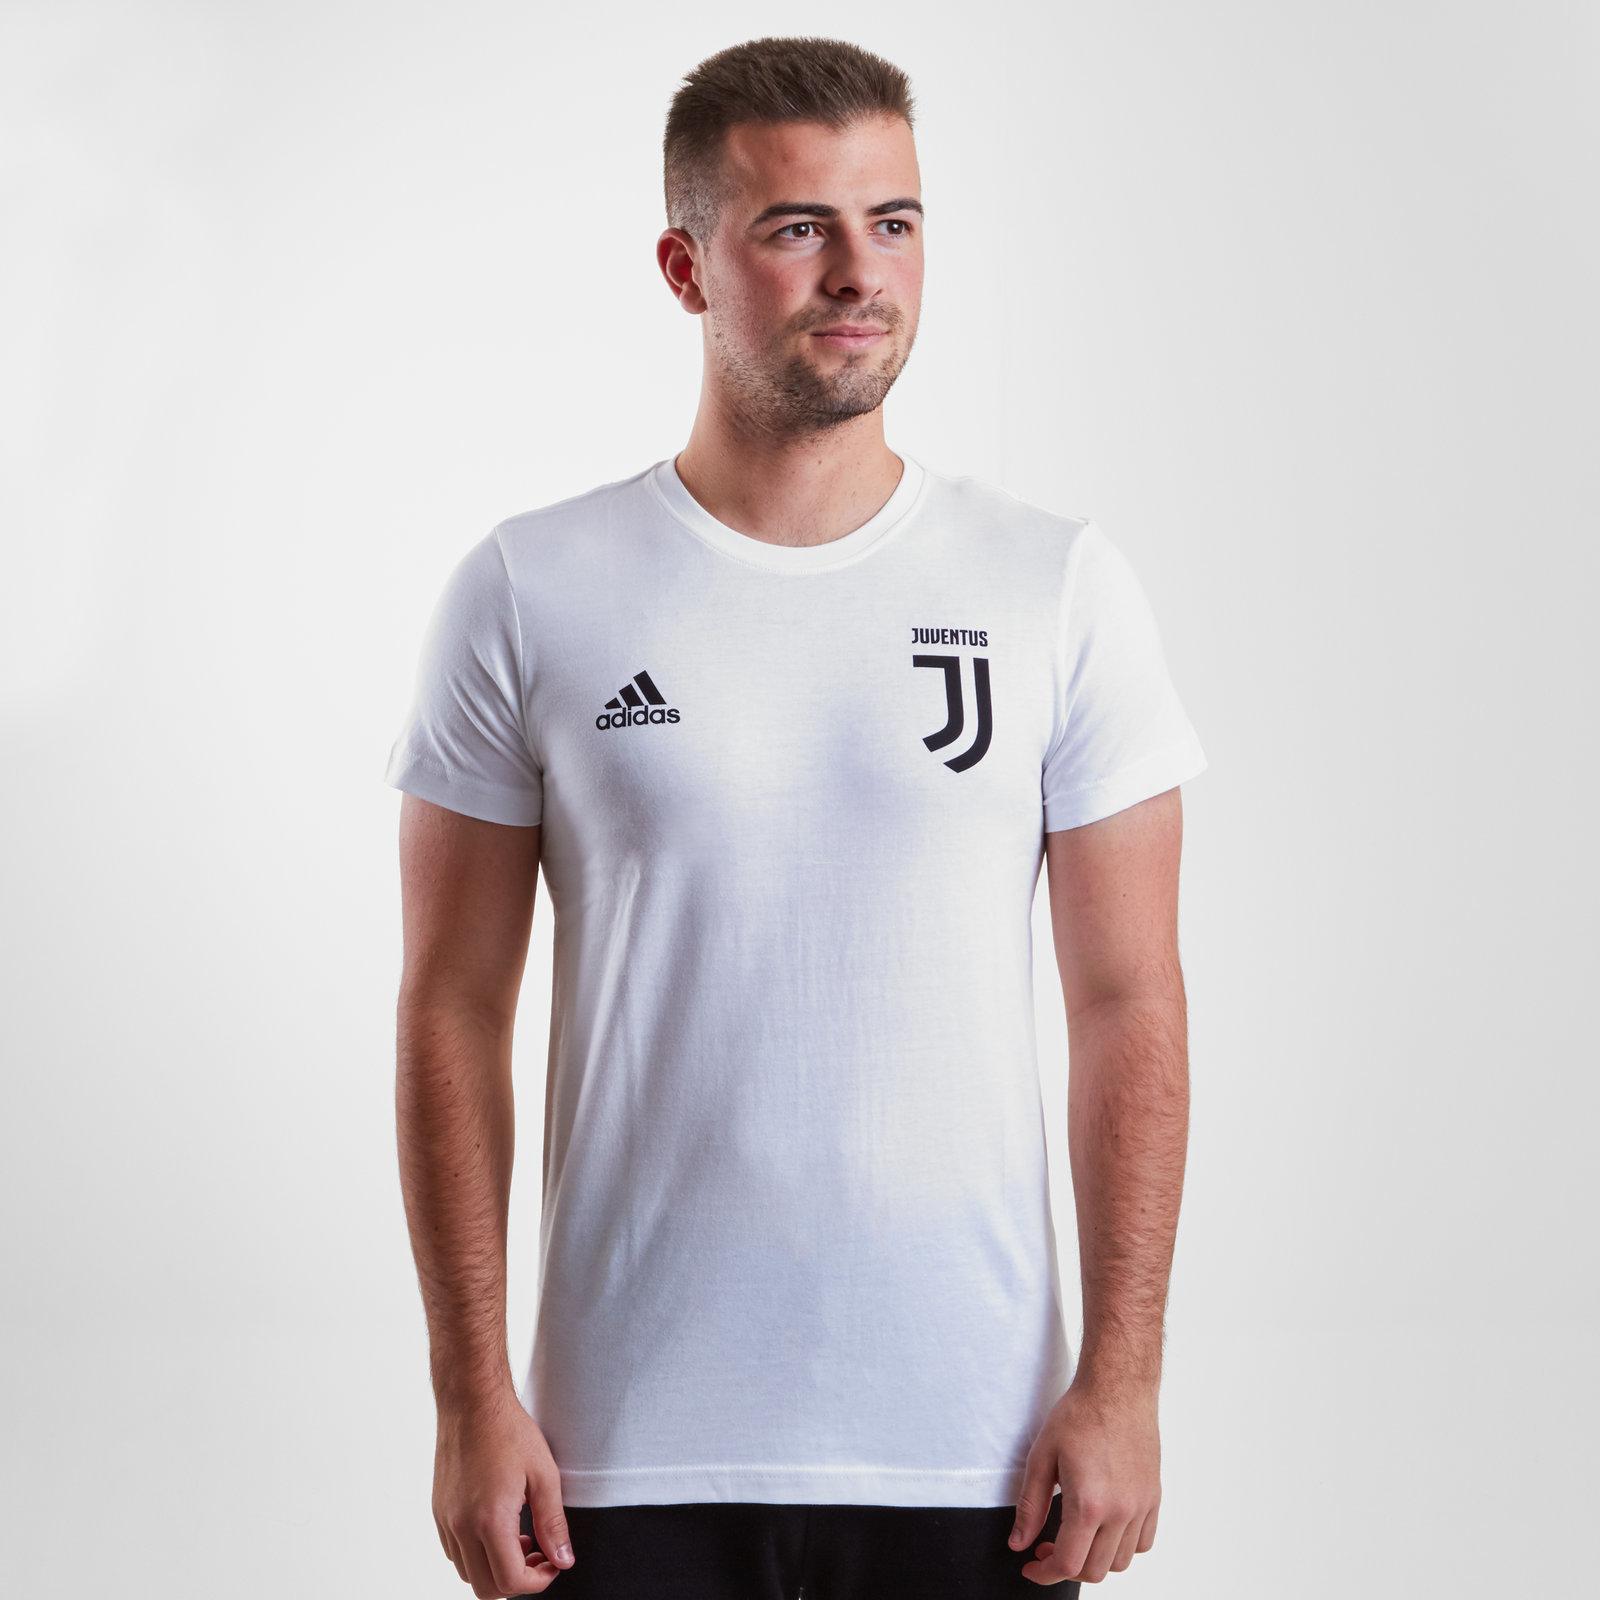 Image of Juventus Turin Graphic Football T-Shirt